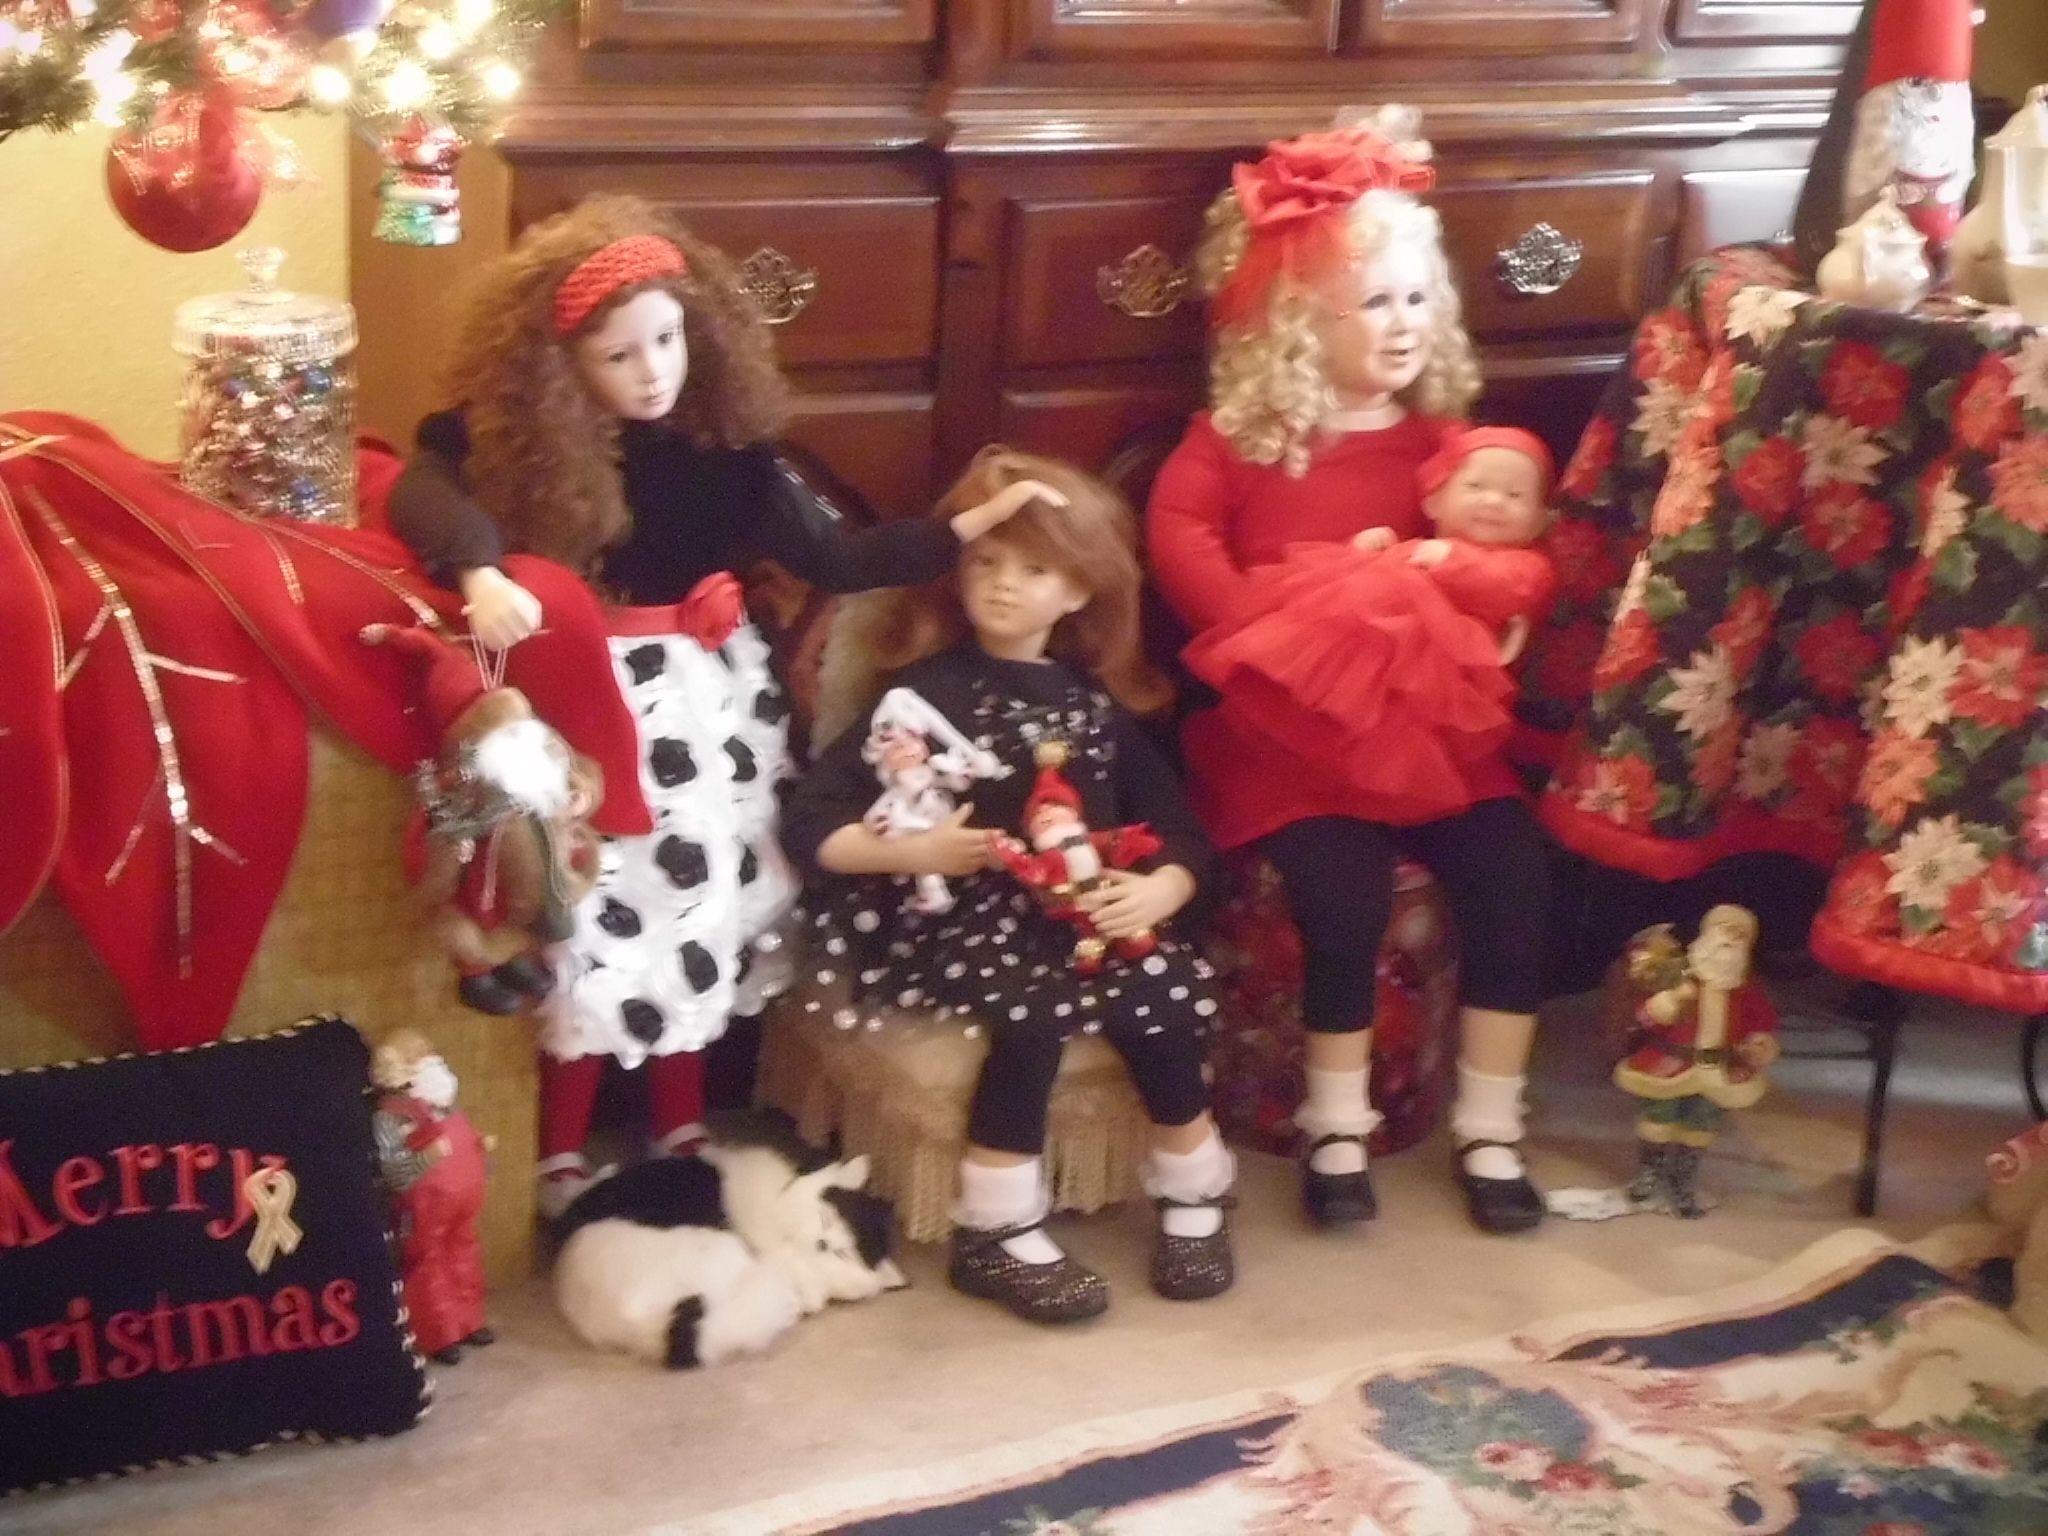 Pin by Katherine Lees on Lees Christmas House Tour   Christmas tours, Christmas tree themes ...